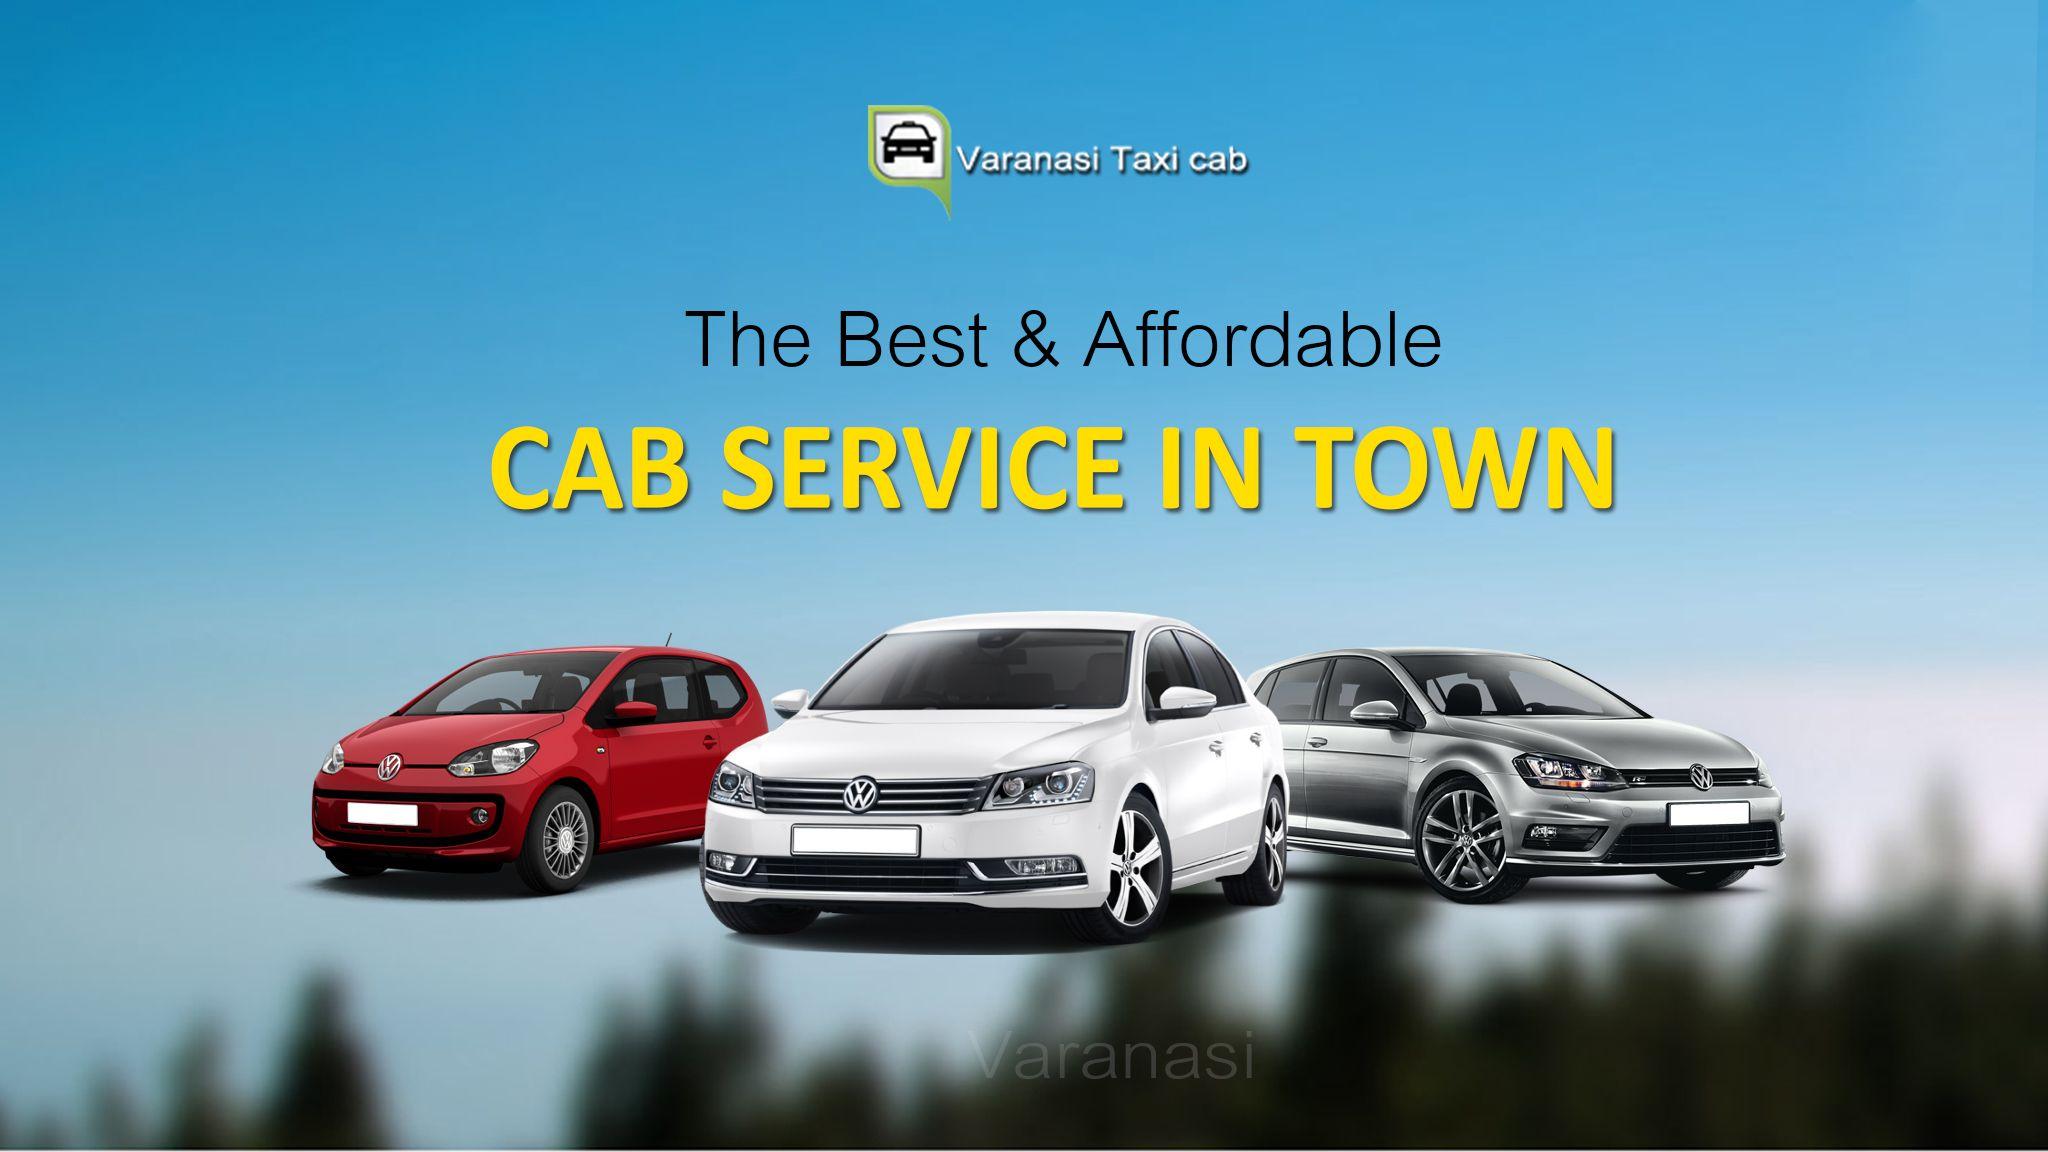 Varanasi Taxi Cab Is The Best Car Rental Cab Service In